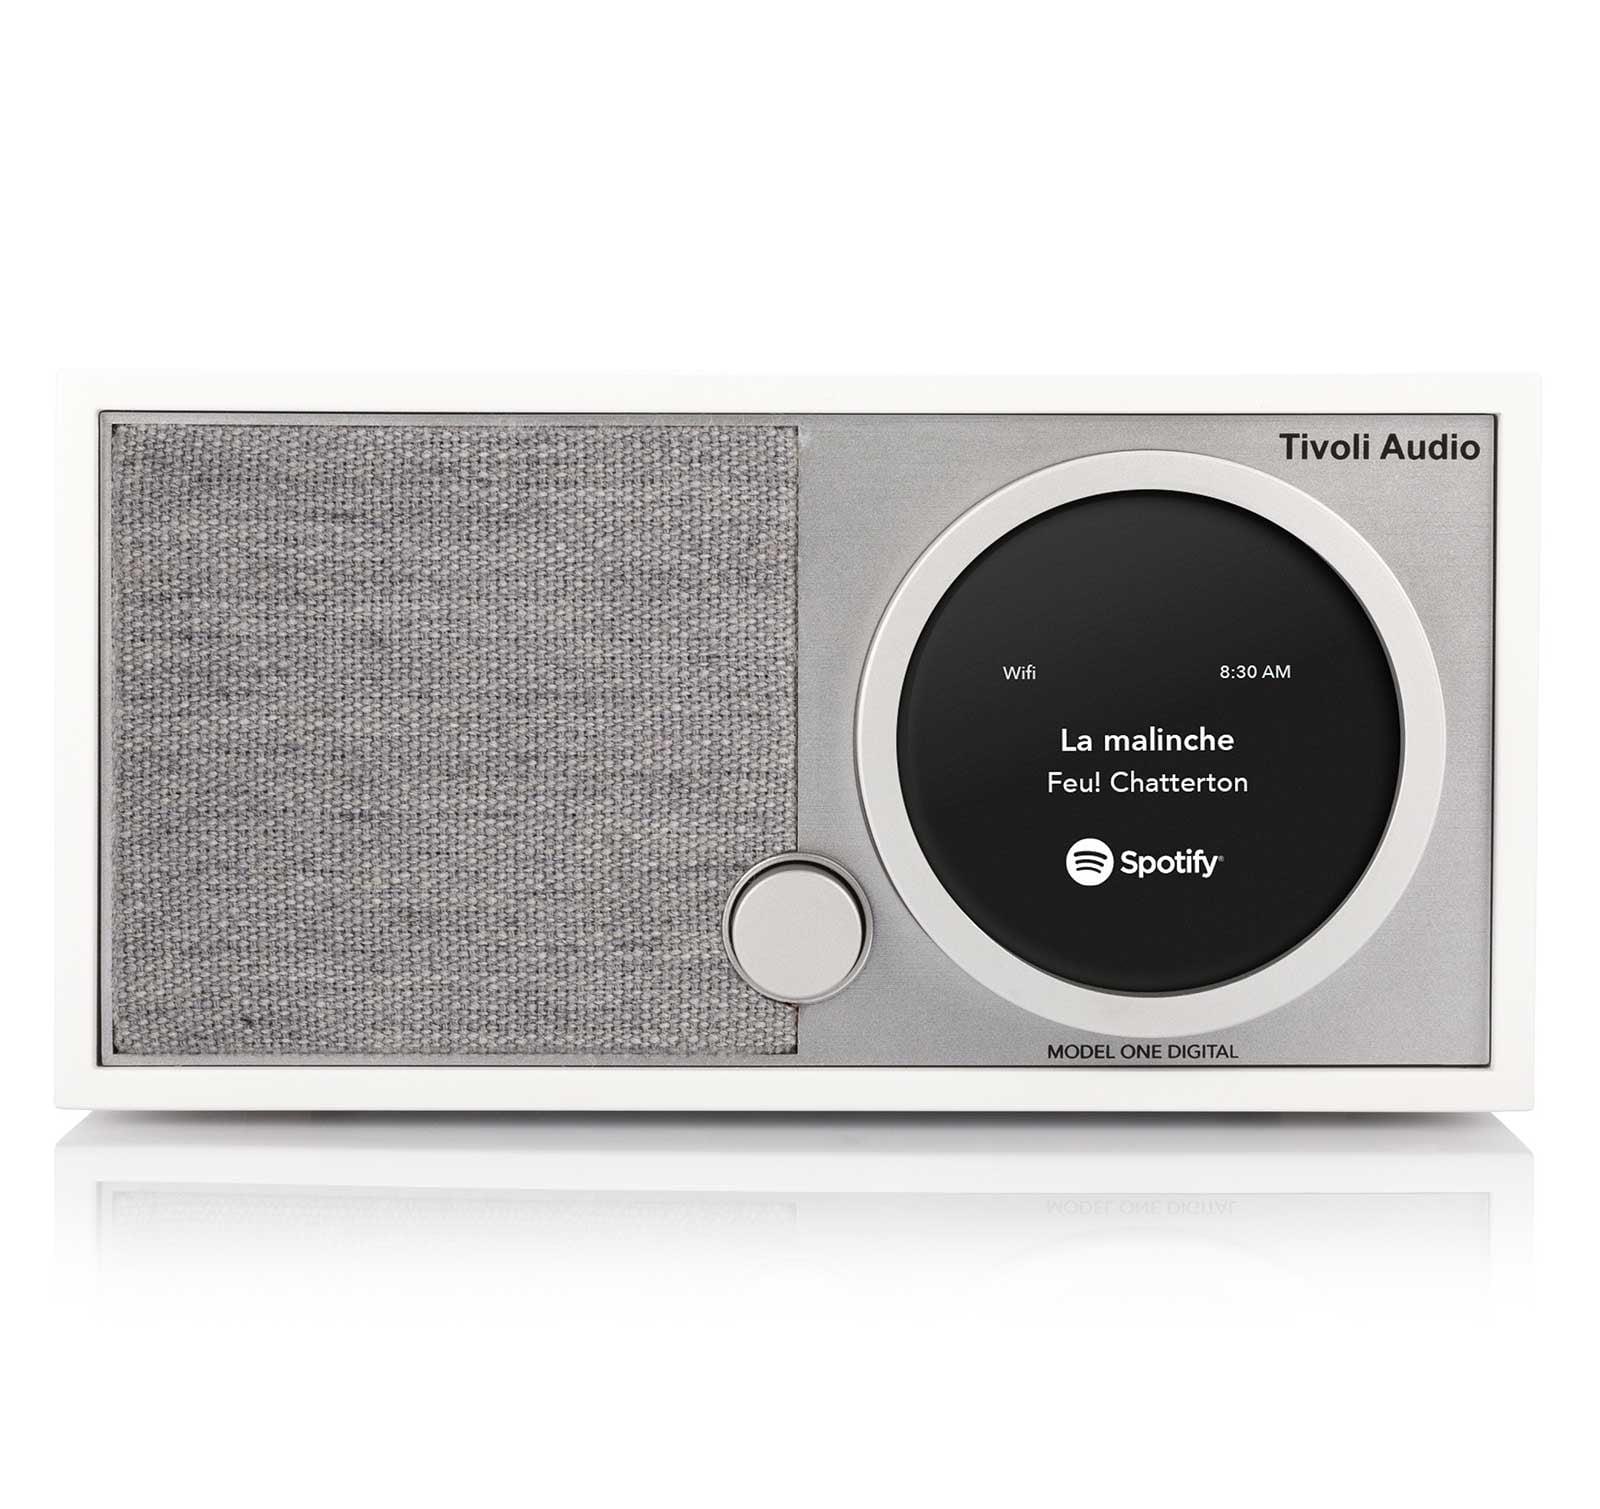 Tivoli Audio Model One Digital White Gray FM   Wi-Fi   Bluetooth   Table radio by Tivoli